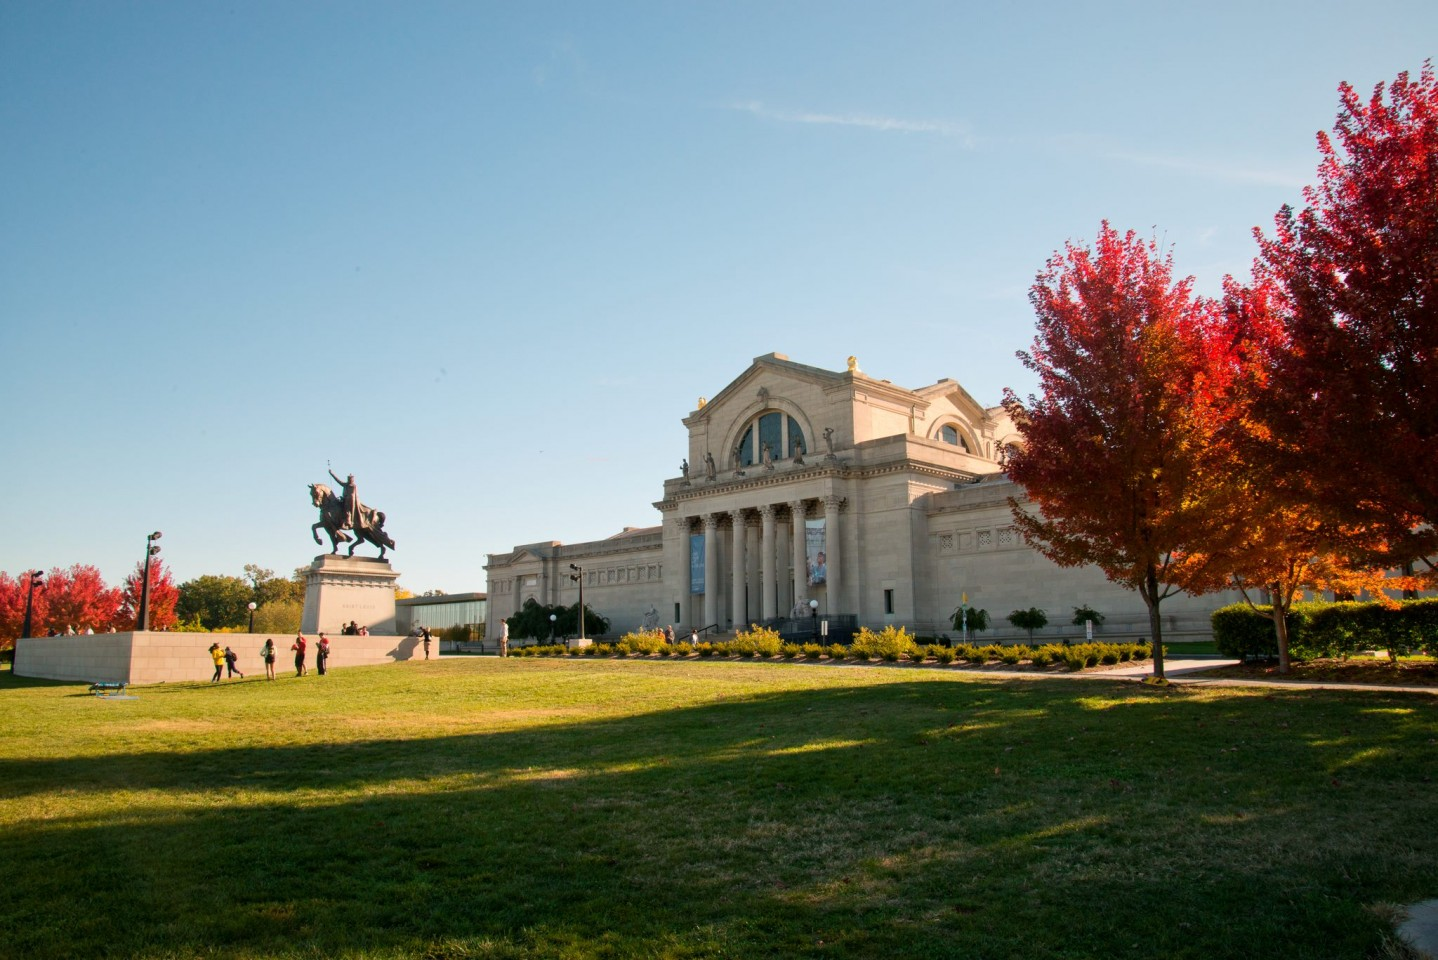 Saint Louis Art Museum(セントルイス美術館)